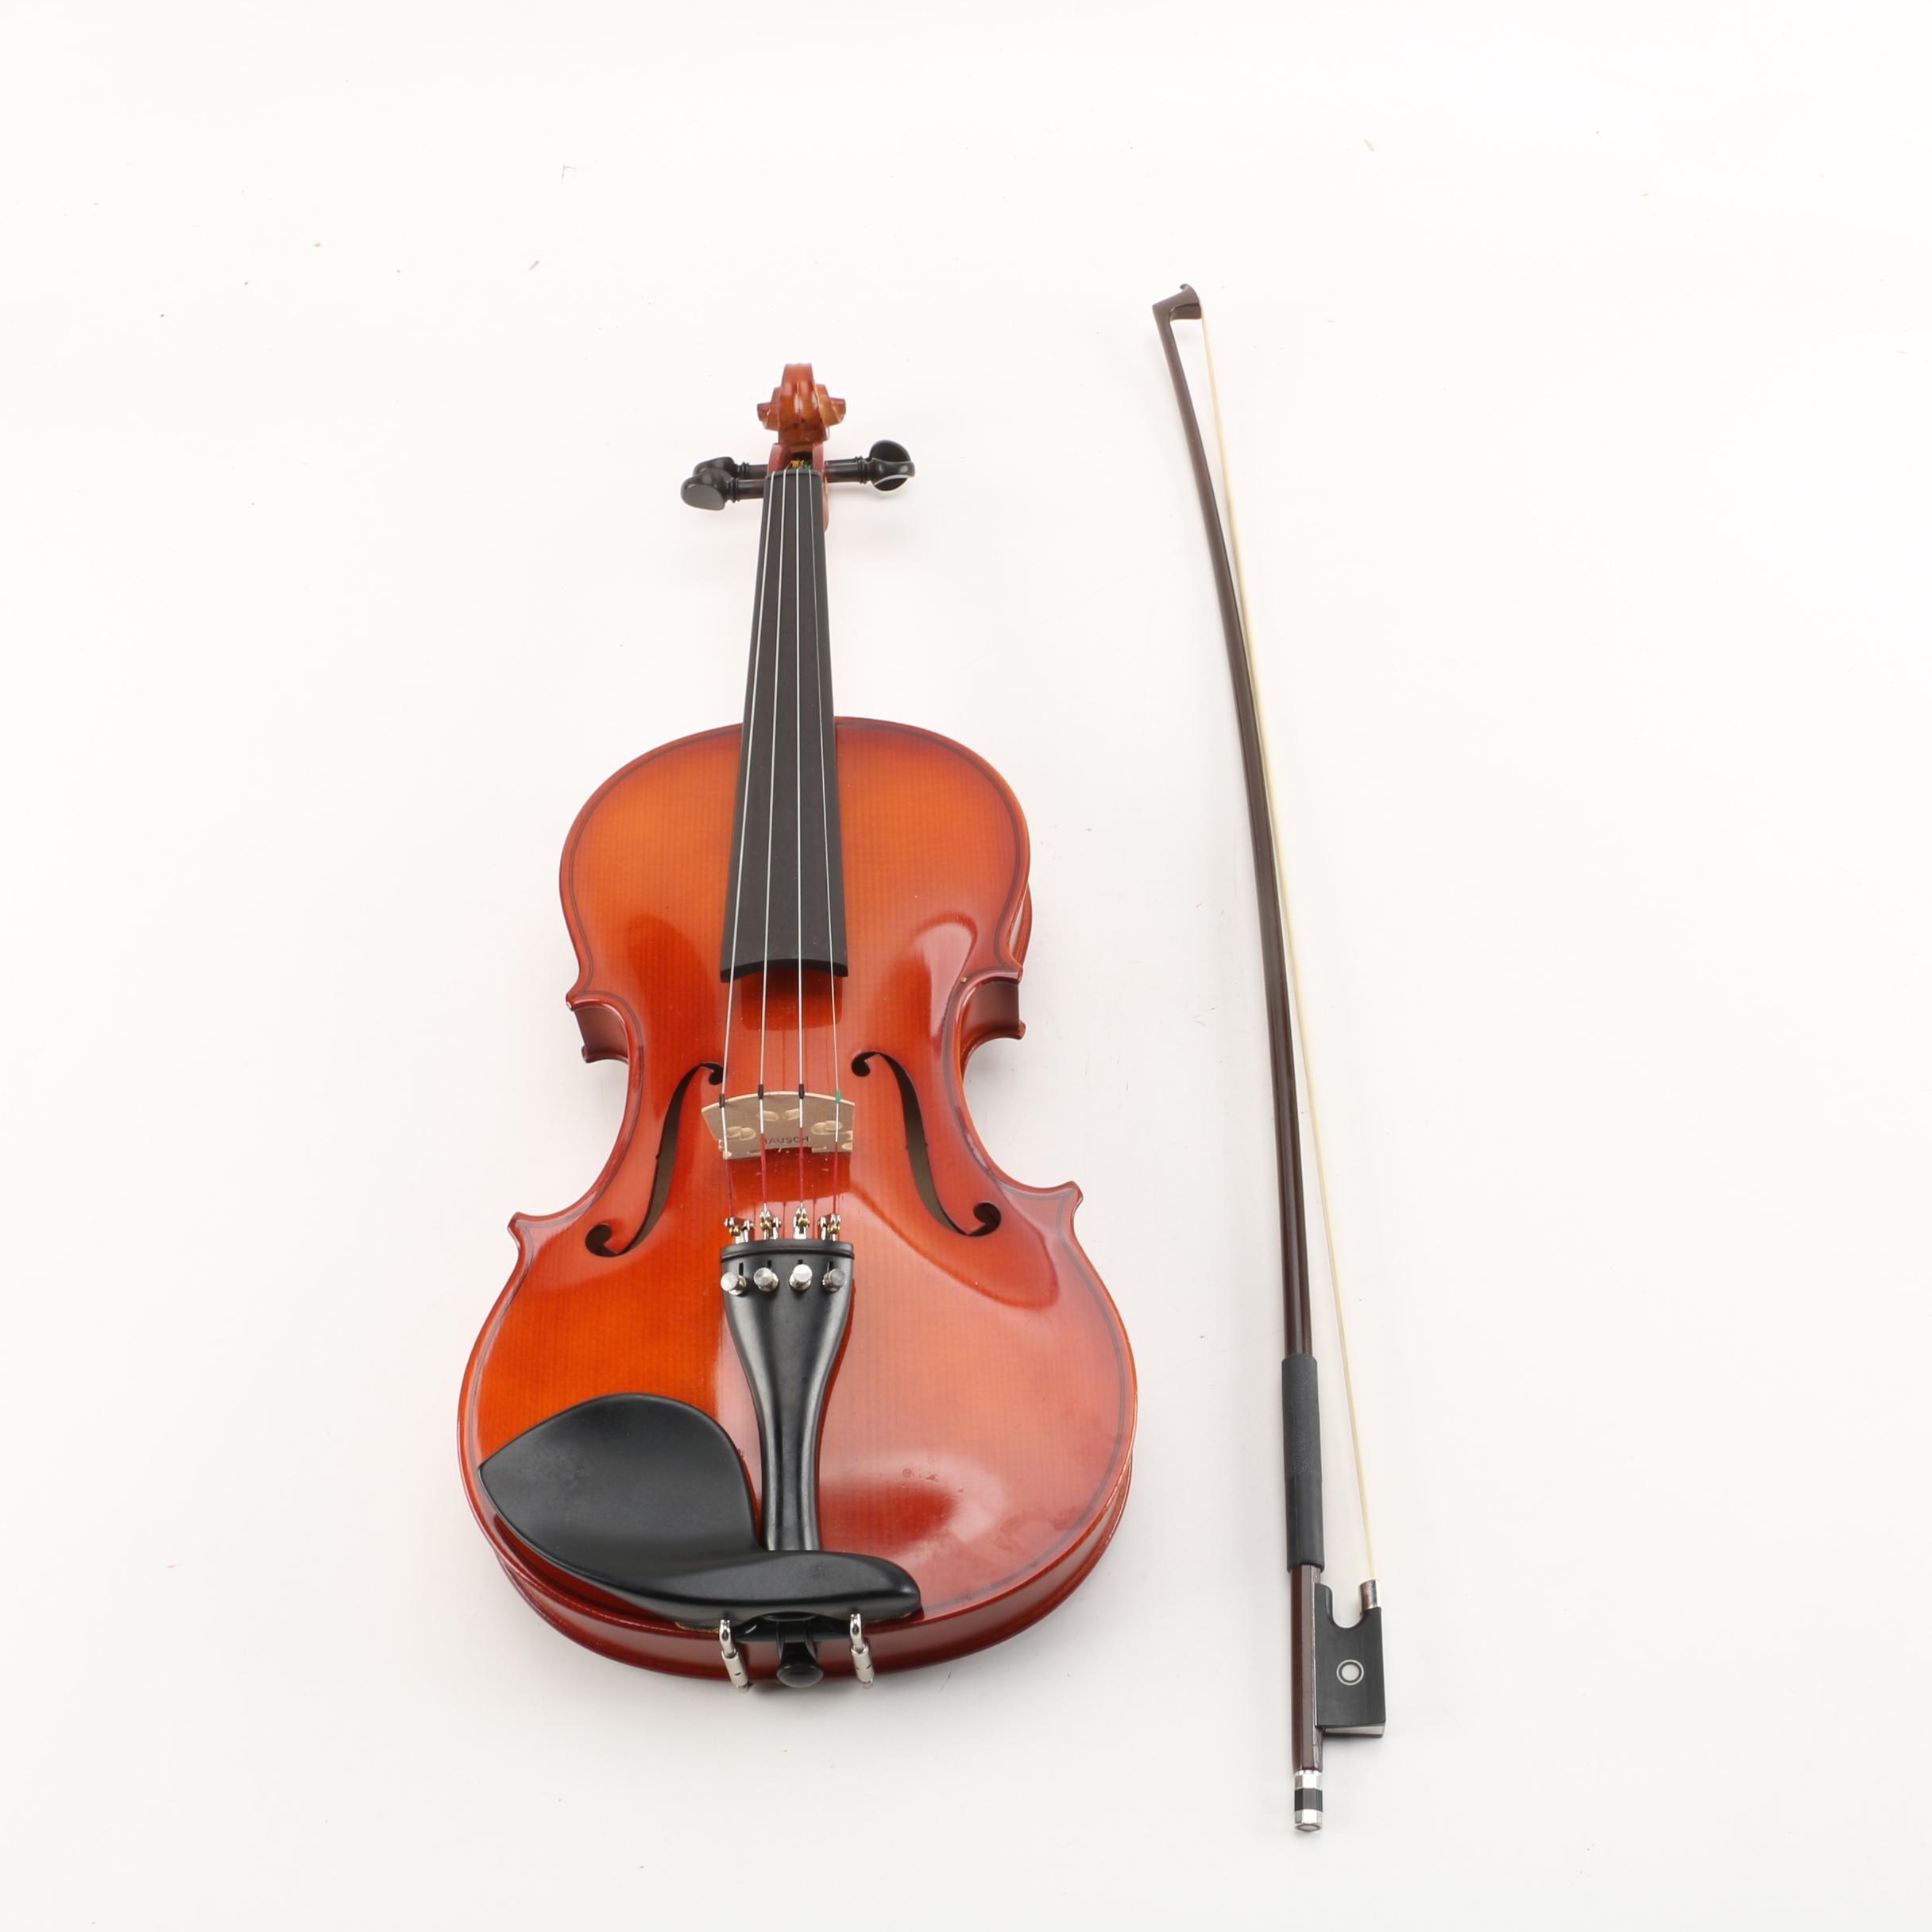 Scherl & Roth 4/4 Stradivarius Copy Violin